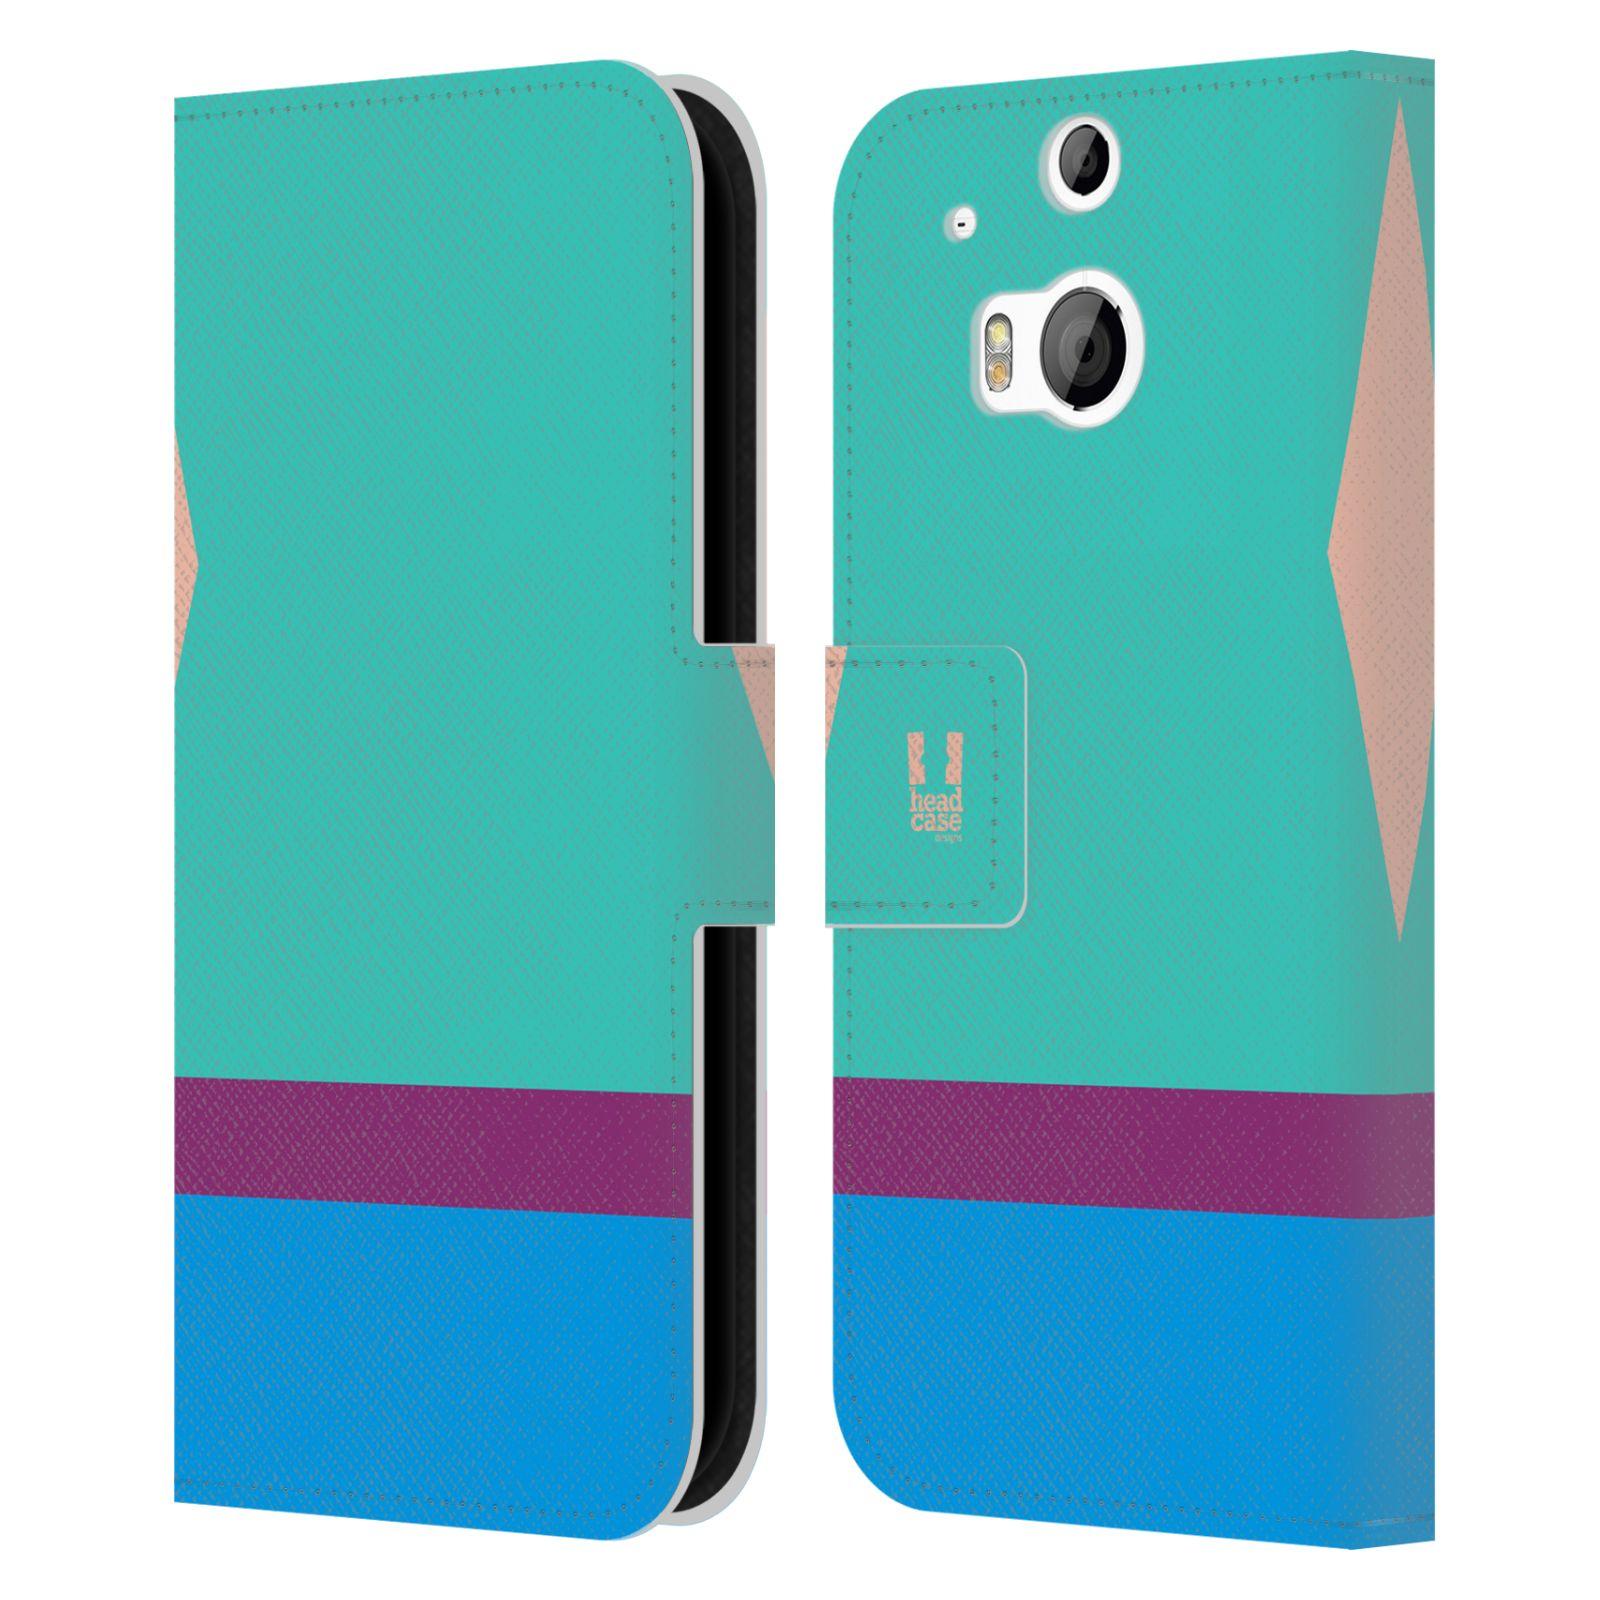 HEAD CASE Flipové pouzdro pro mobil HTC ONE M8/M8s barevné tvary modrá a fialový pruh